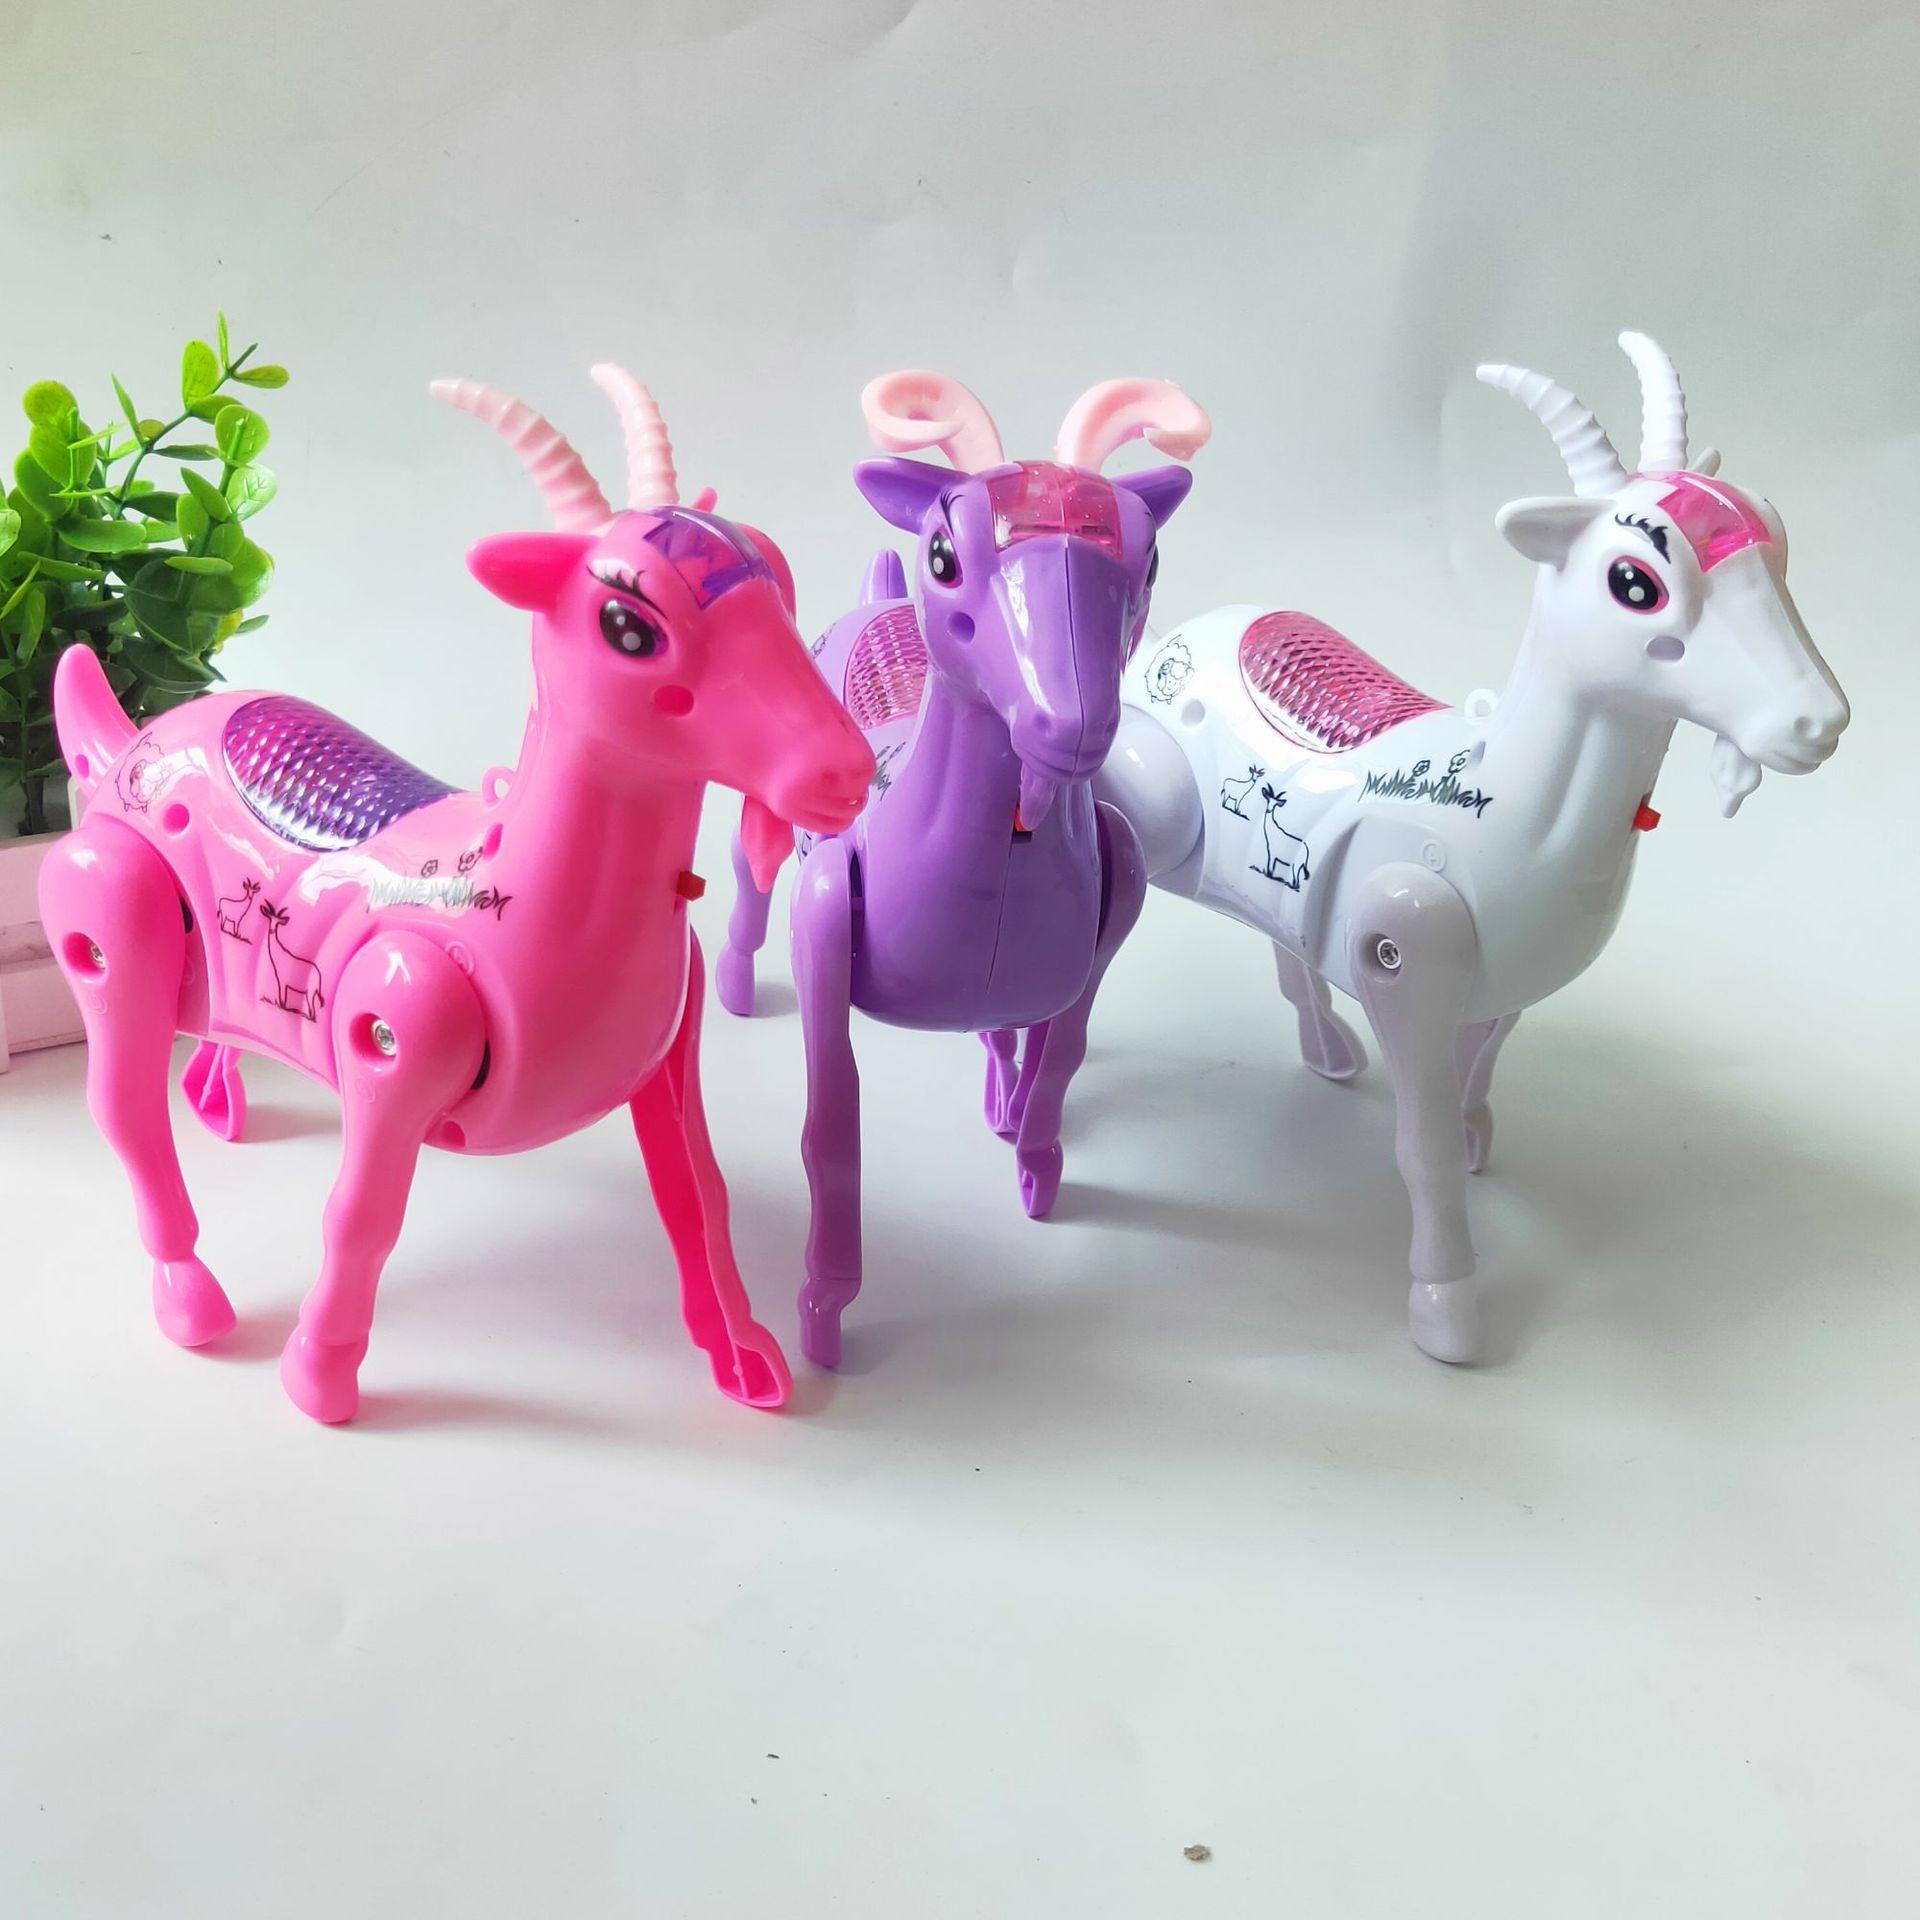 Hot Electric Music Walking Sheep Toys LED Light Glow Electronic Pets Lantern Toy Children Kids Baby Girl Boy Educational Toys